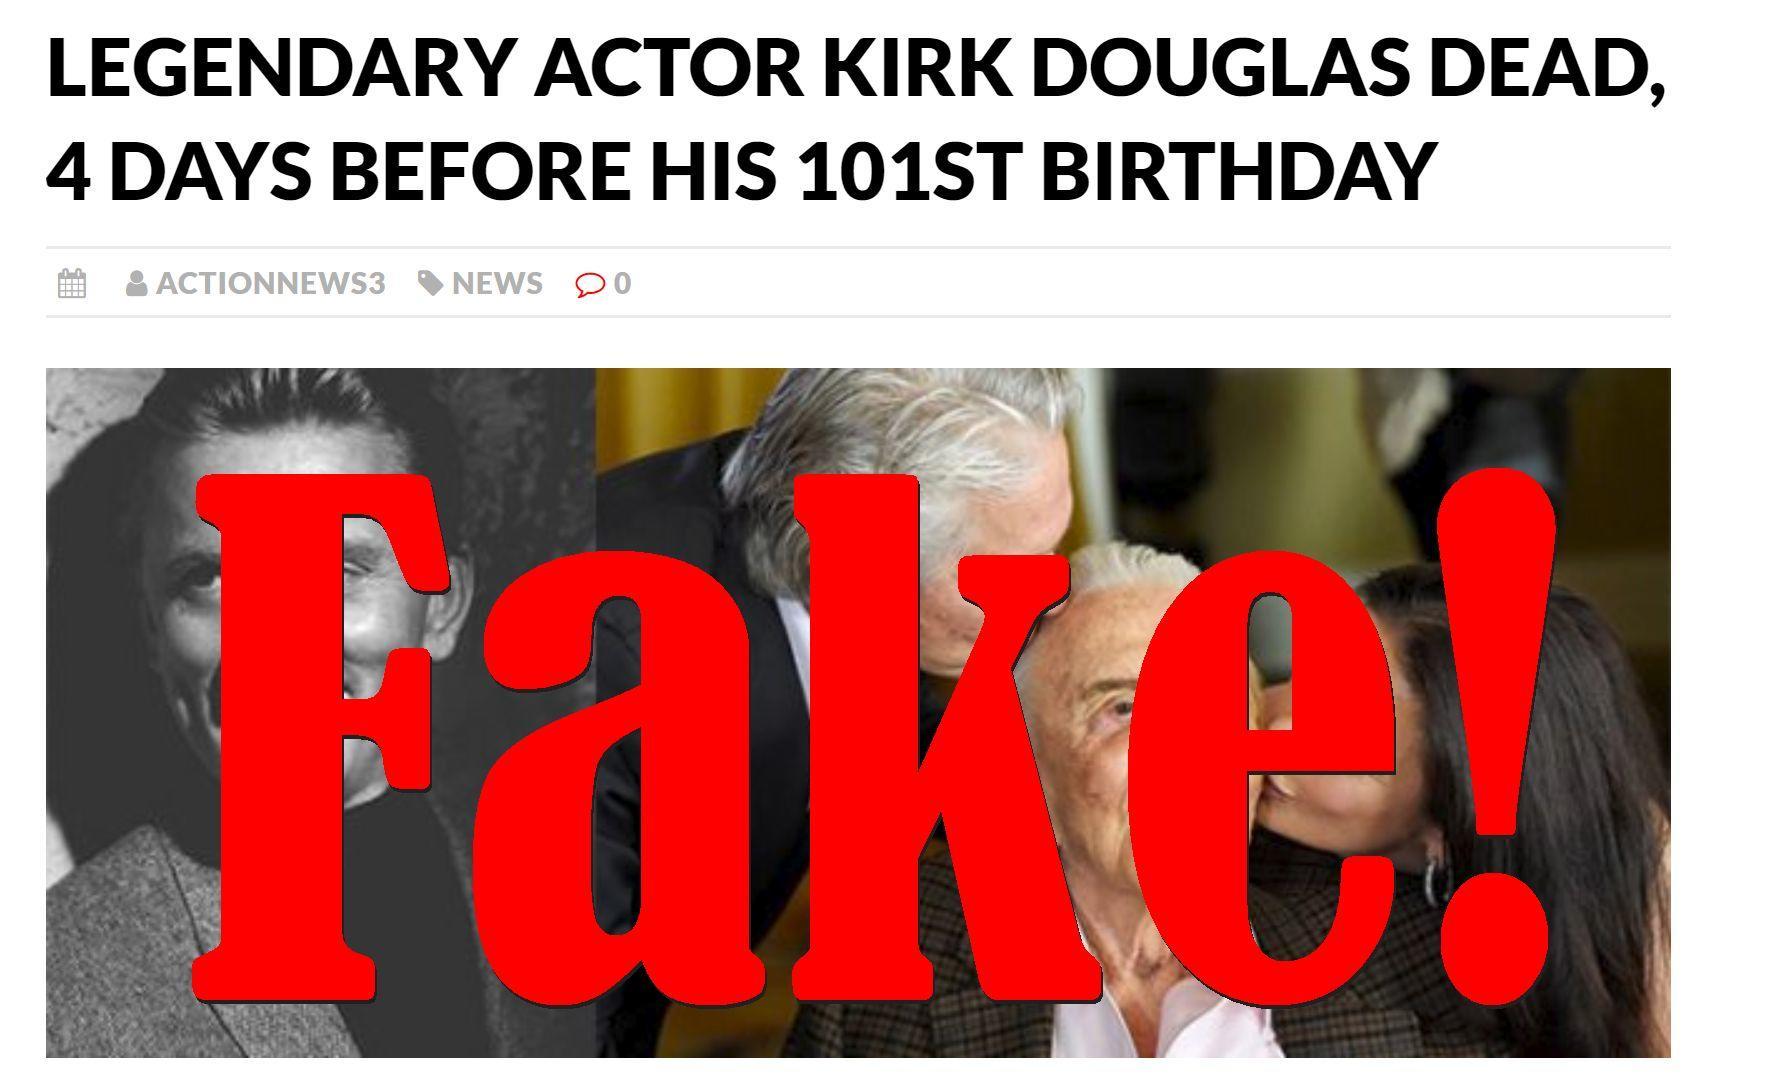 Fake News: Legendary Actor Kirk Douglas NOT Dead 4 Days Before His 101st Birthday